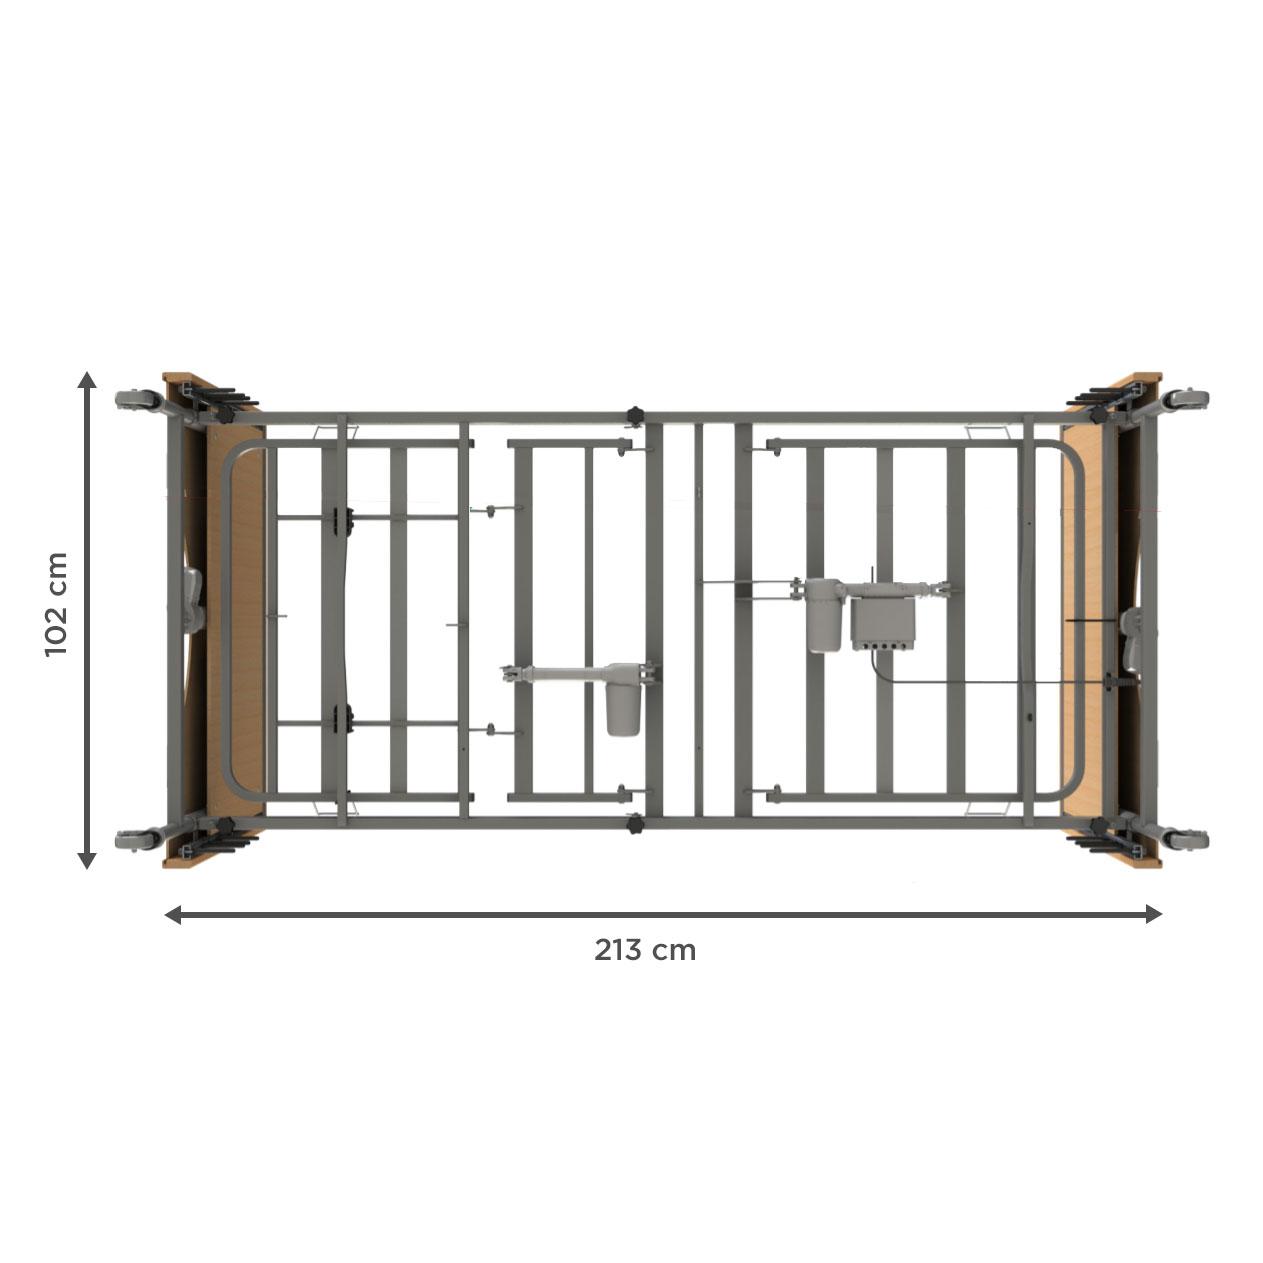 alerta-care-bed-dimensions